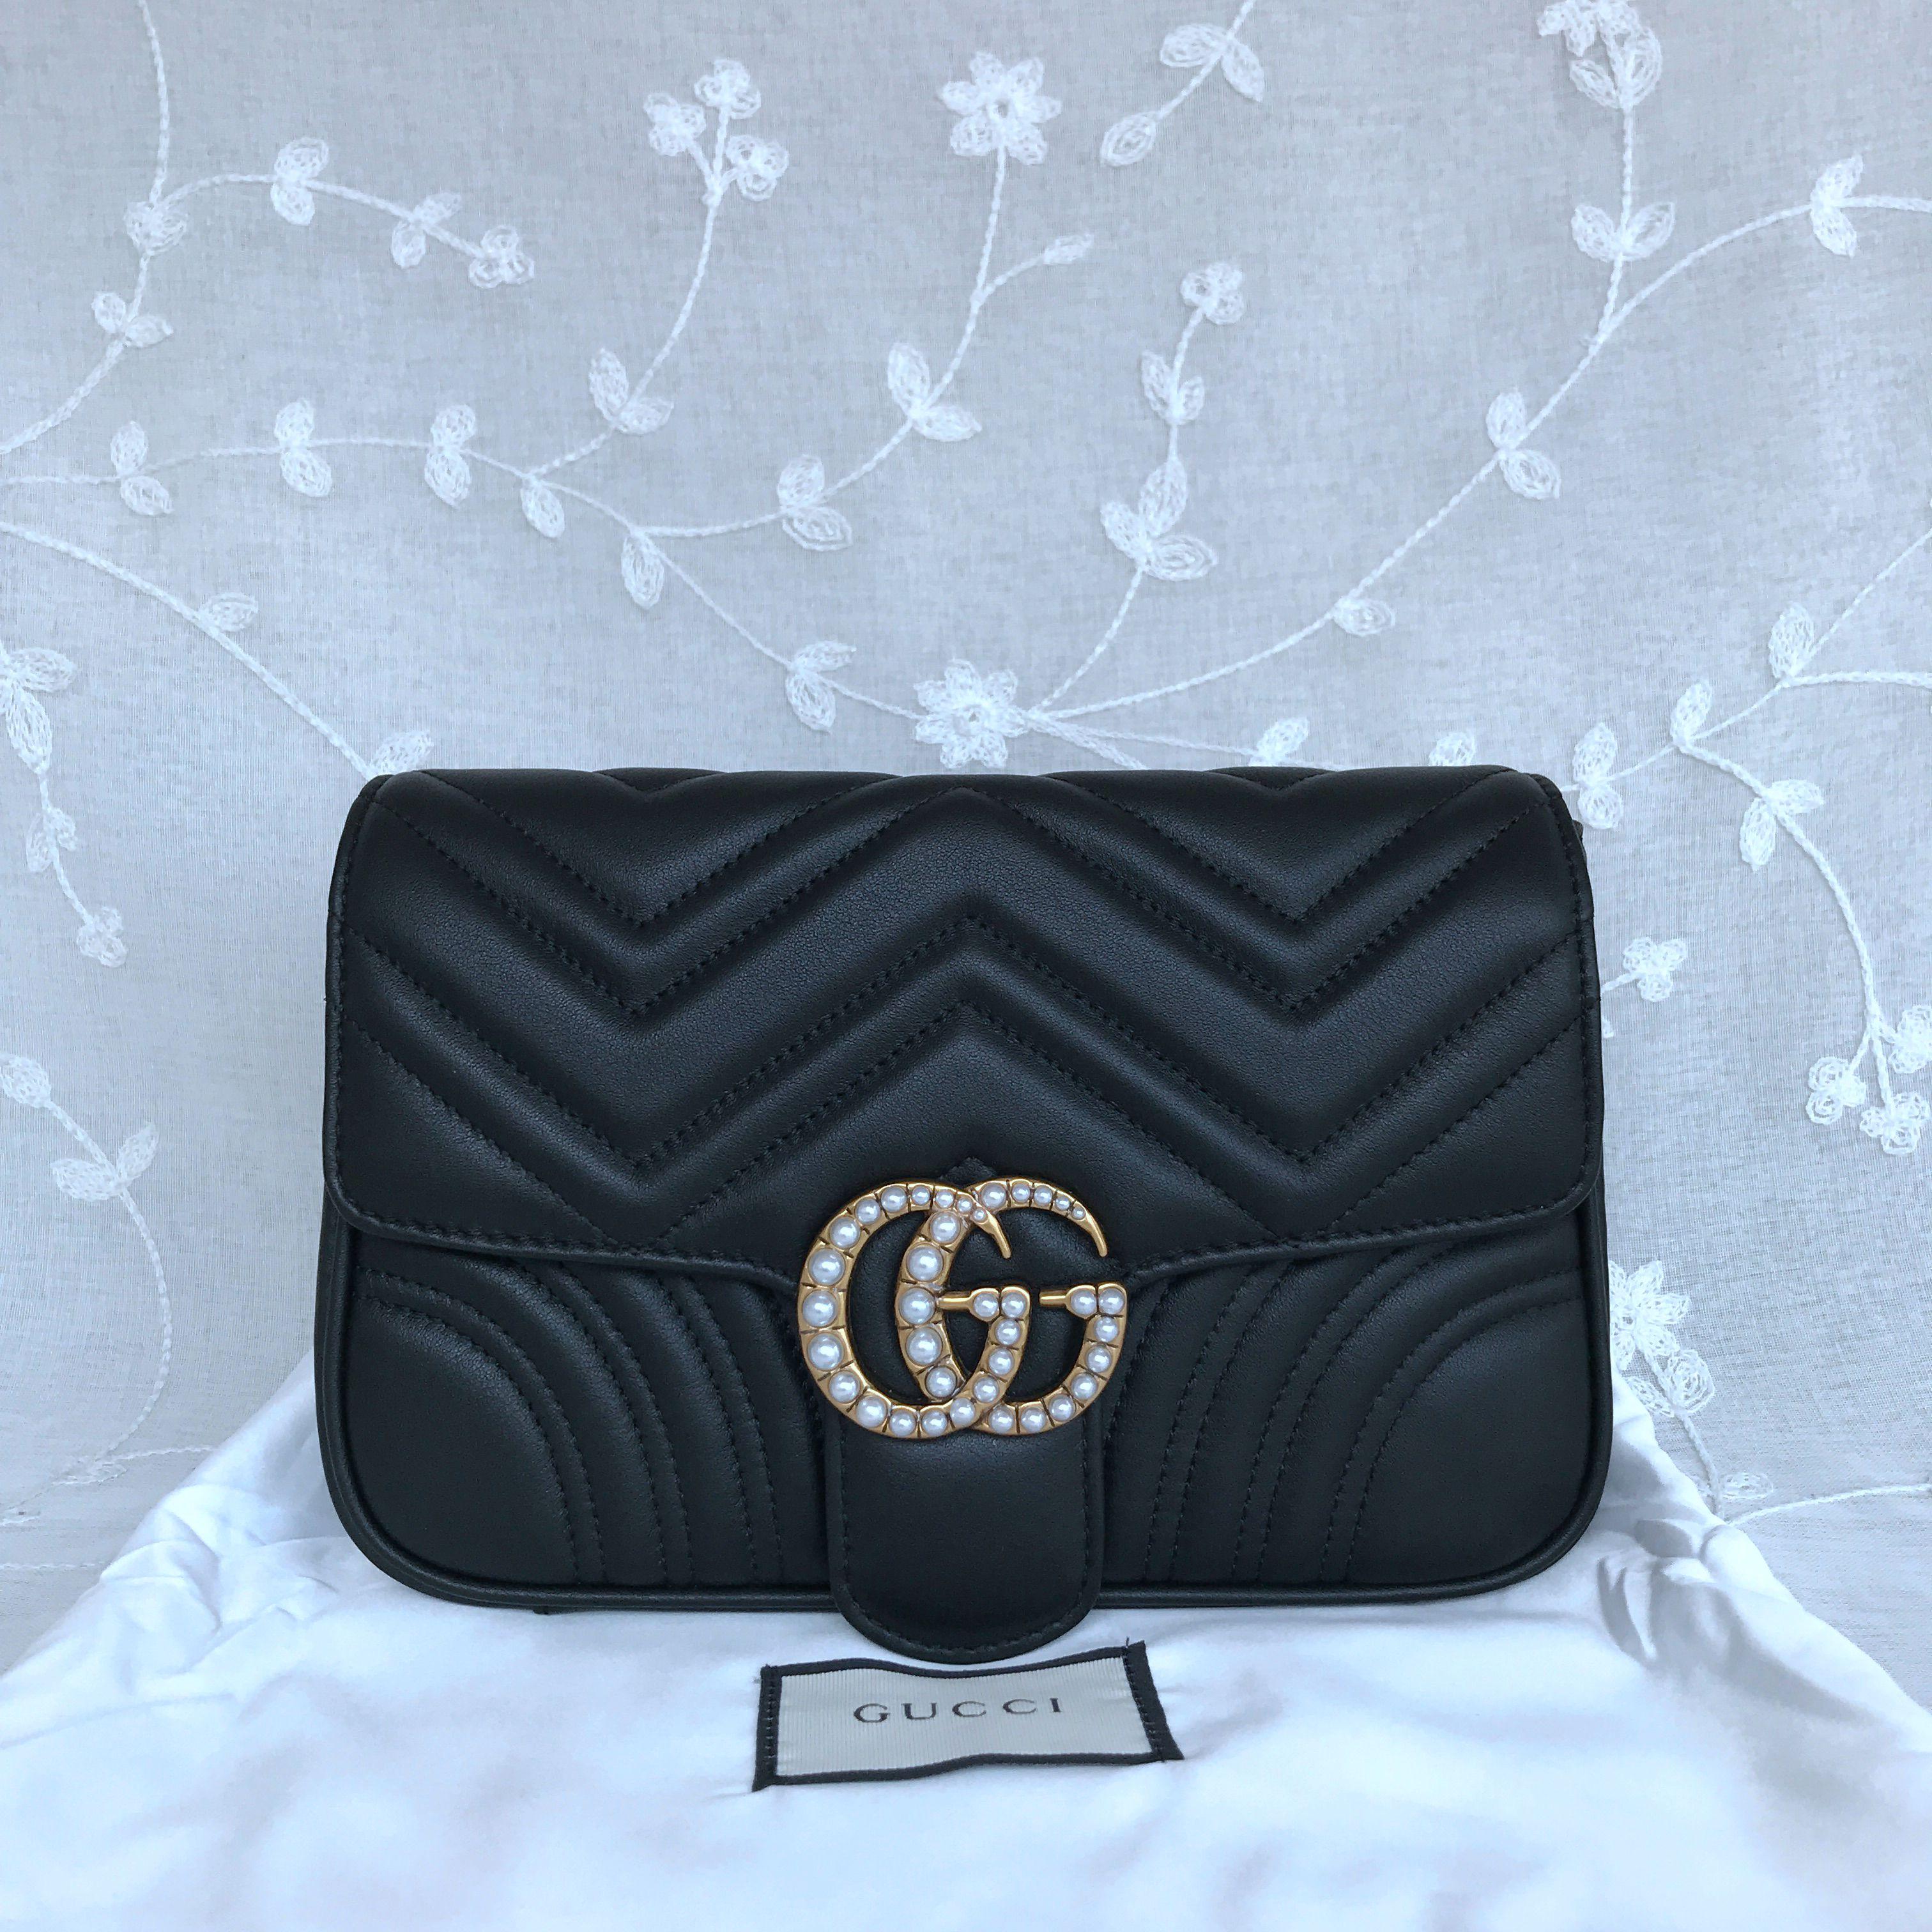 Gucci Marmont Matelasse Shoulder bag 476809